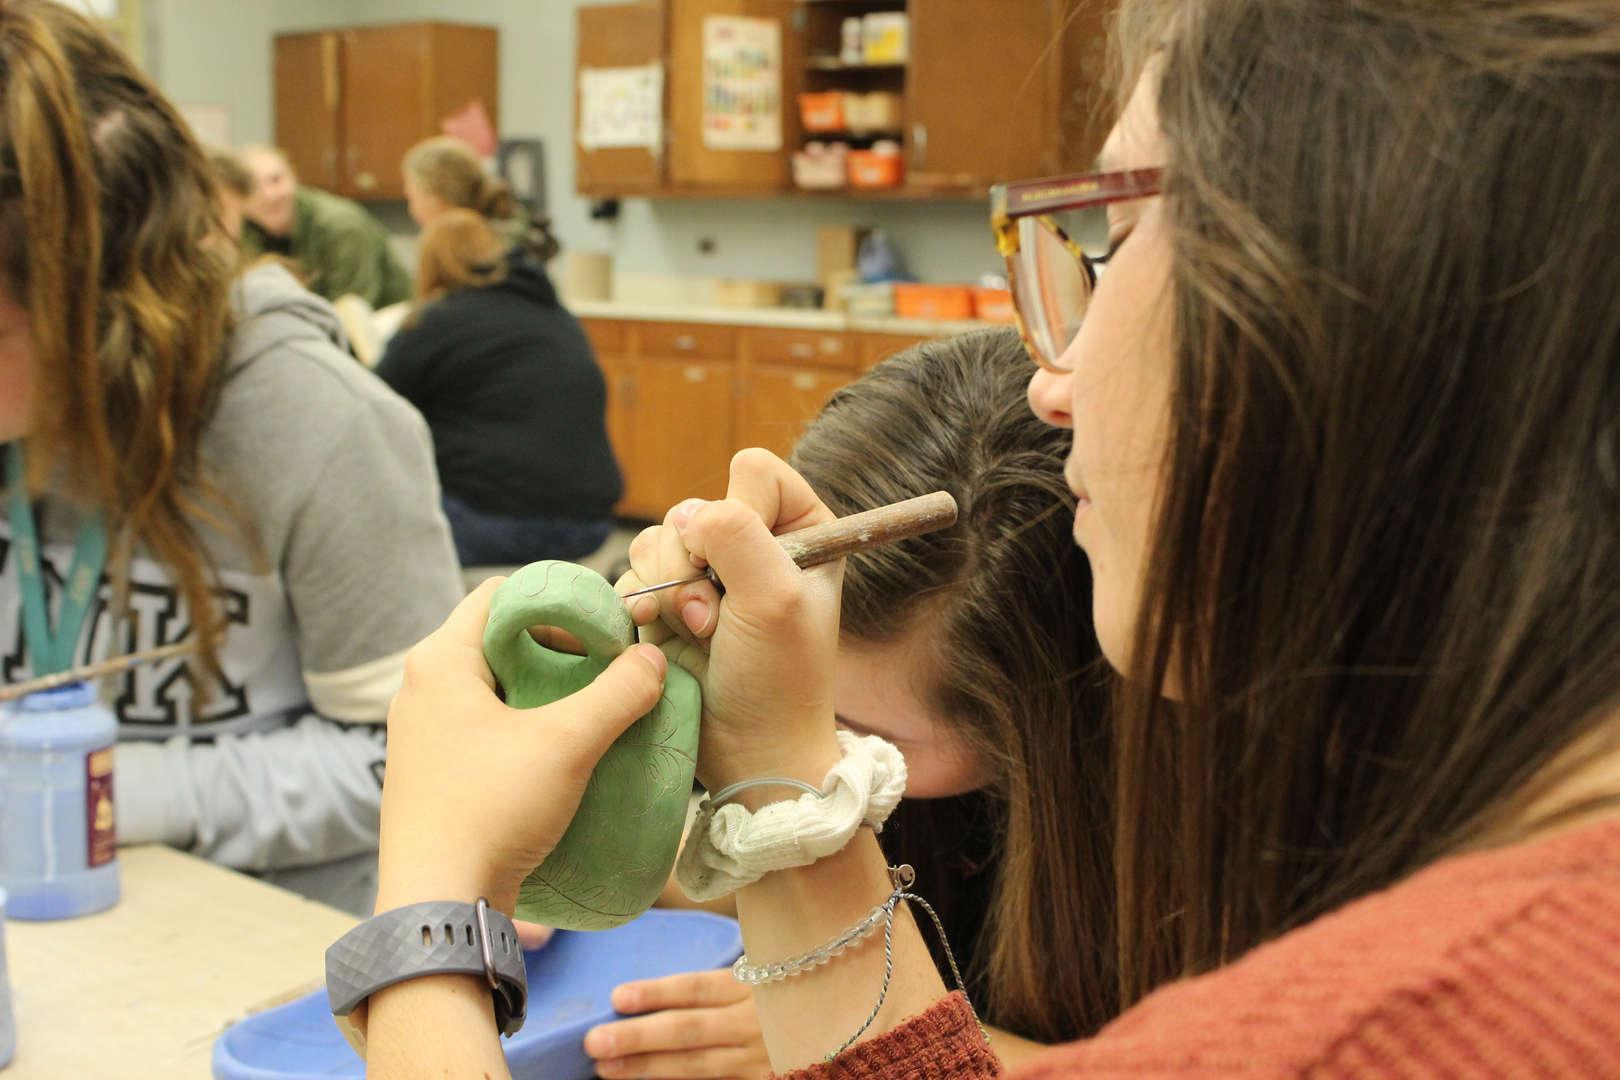 Student carving details into her handmade mug.